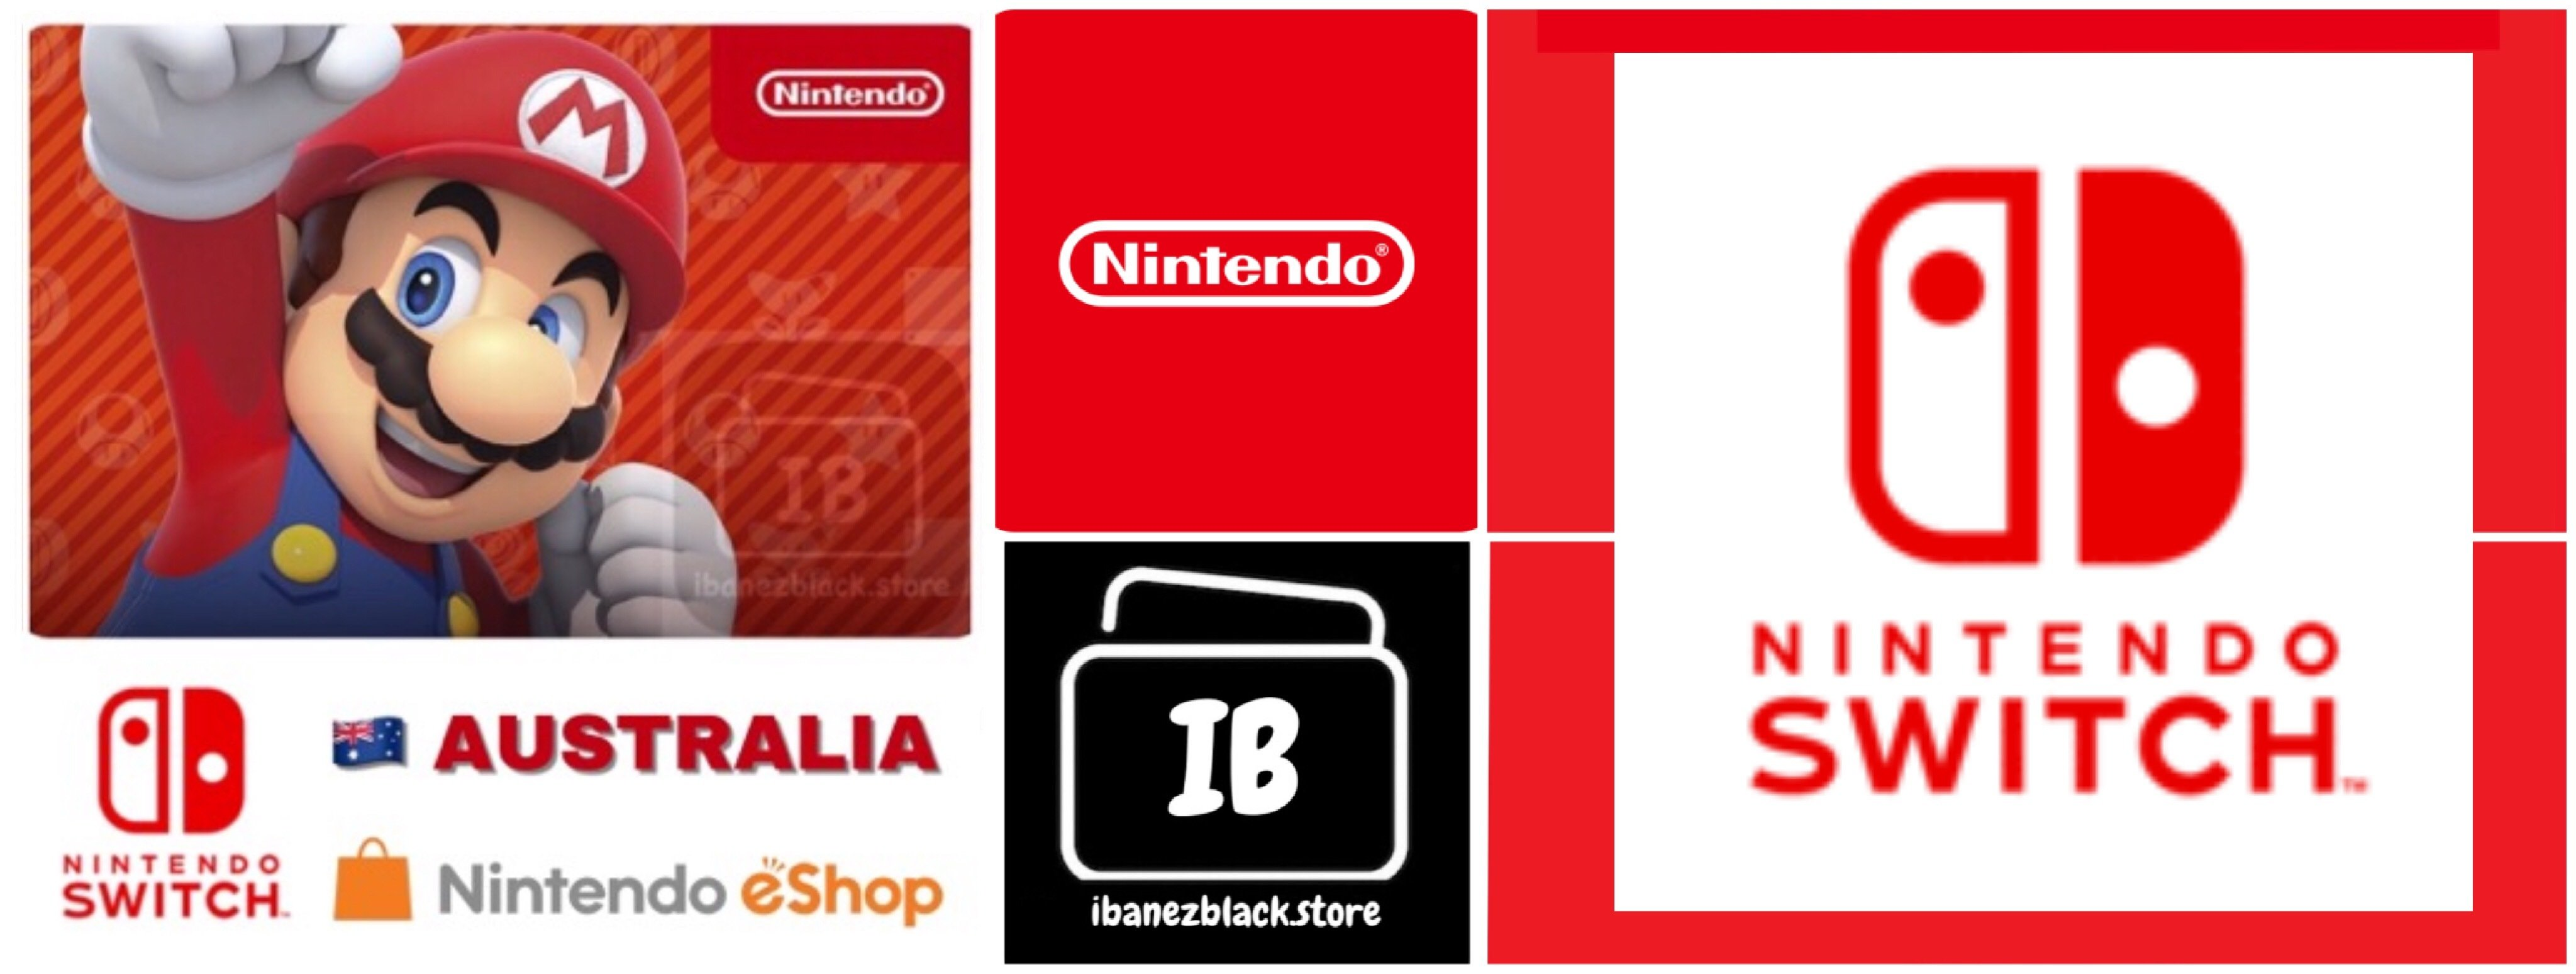 Nintendo eShop Card Australia - Switch / Wii U / 3DS